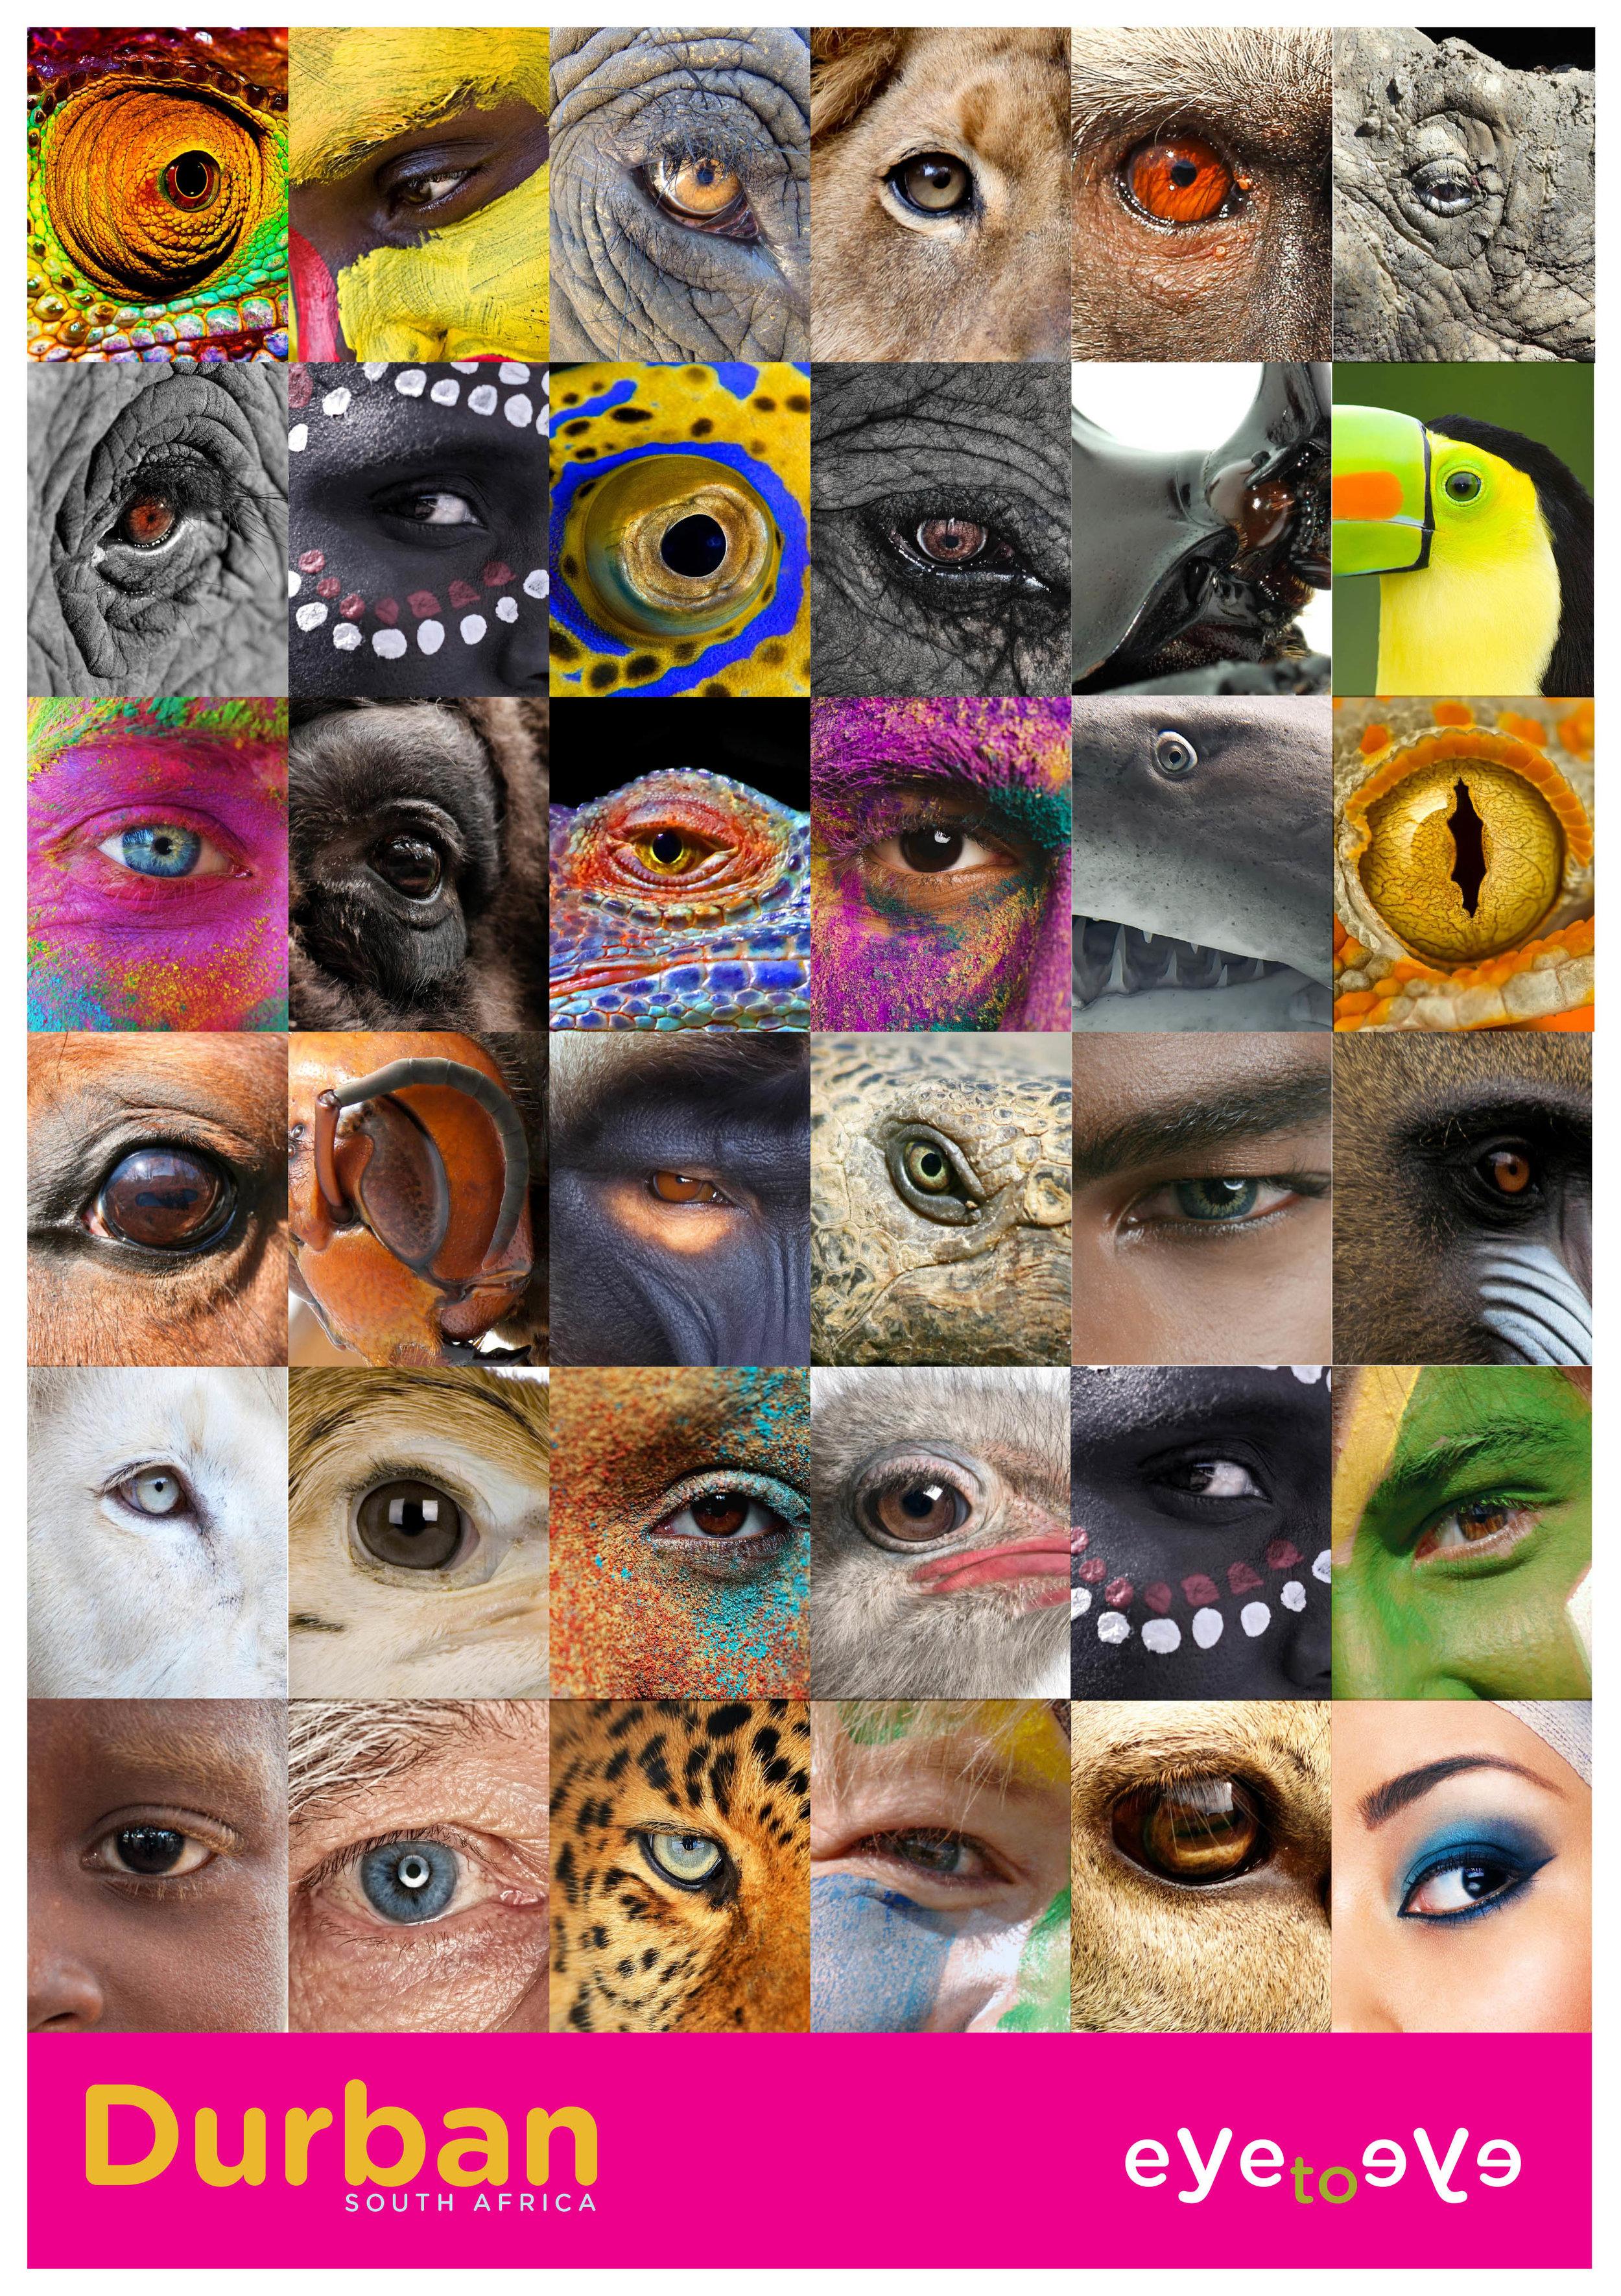 eye to eyeA.jpg